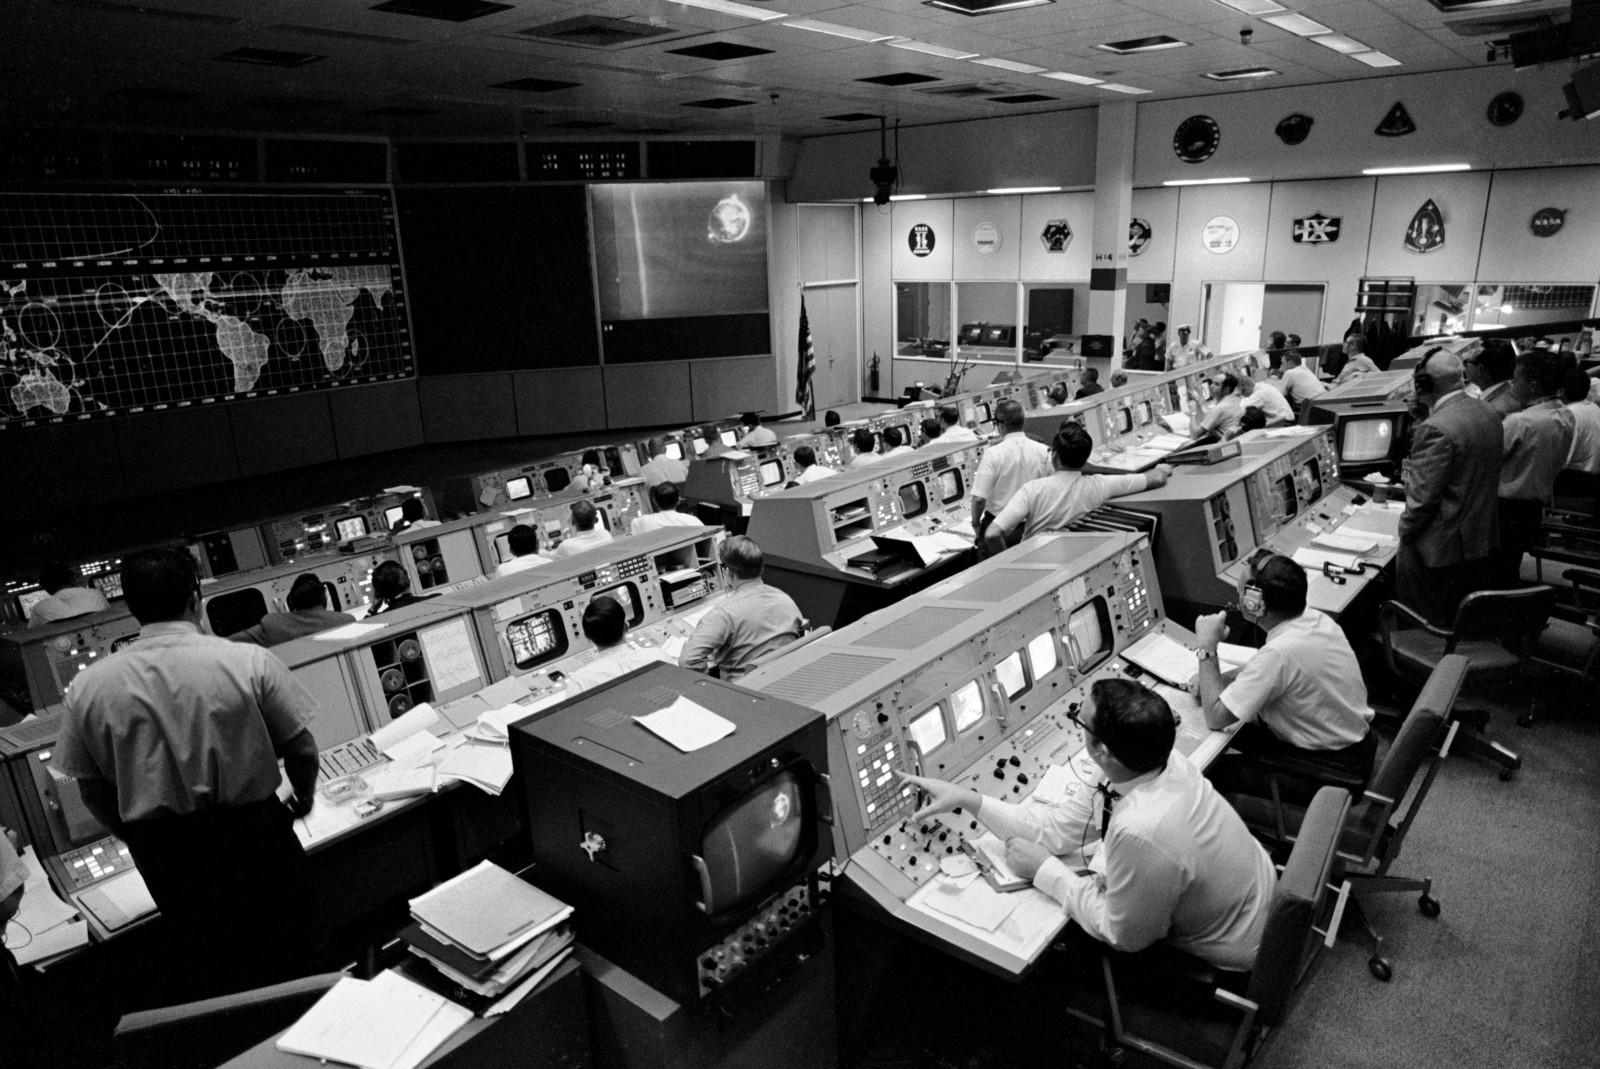 Apollo 10 Moon Mission Control at NASA